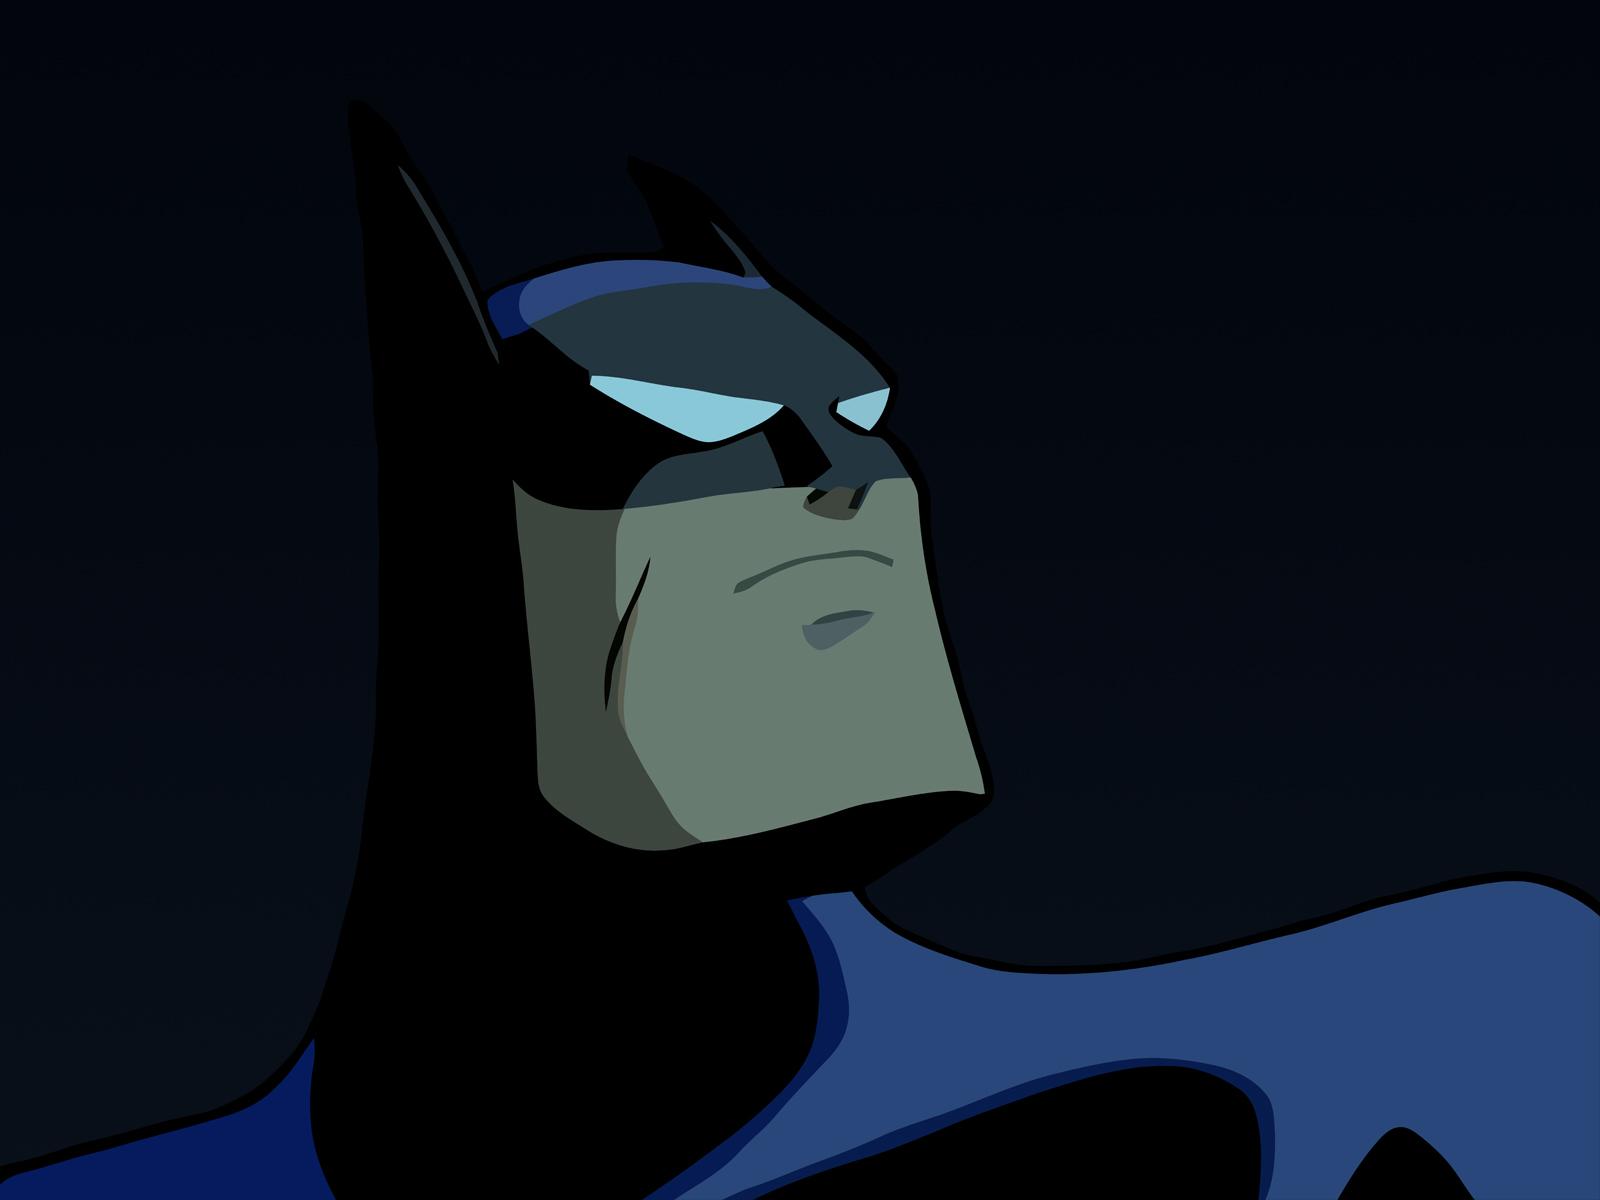 [5ML] « Le prix du pardon » ft. Batman D2qnug0-1fba1444-c5b7-4742-a4a0-b64f37bfcb35.jpg?token=eyJ0eXAiOiJKV1QiLCJhbGciOiJIUzI1NiJ9.eyJzdWIiOiJ1cm46YXBwOiIsImlzcyI6InVybjphcHA6Iiwib2JqIjpbW3sicGF0aCI6IlwvZlwvMjM4MDQ3ODgtZjBhOC00NzNjLWJkYmQtODI0NWI0OWYzNDhmXC9kMnFudWcwLTFmYmExNDQ0LWM1YjctNDc0Mi1hNGEwLWI2NGYzN2JmY2IzNS5qcGcifV1dLCJhdWQiOlsidXJuOnNlcnZpY2U6ZmlsZS5kb3dubG9hZCJdfQ